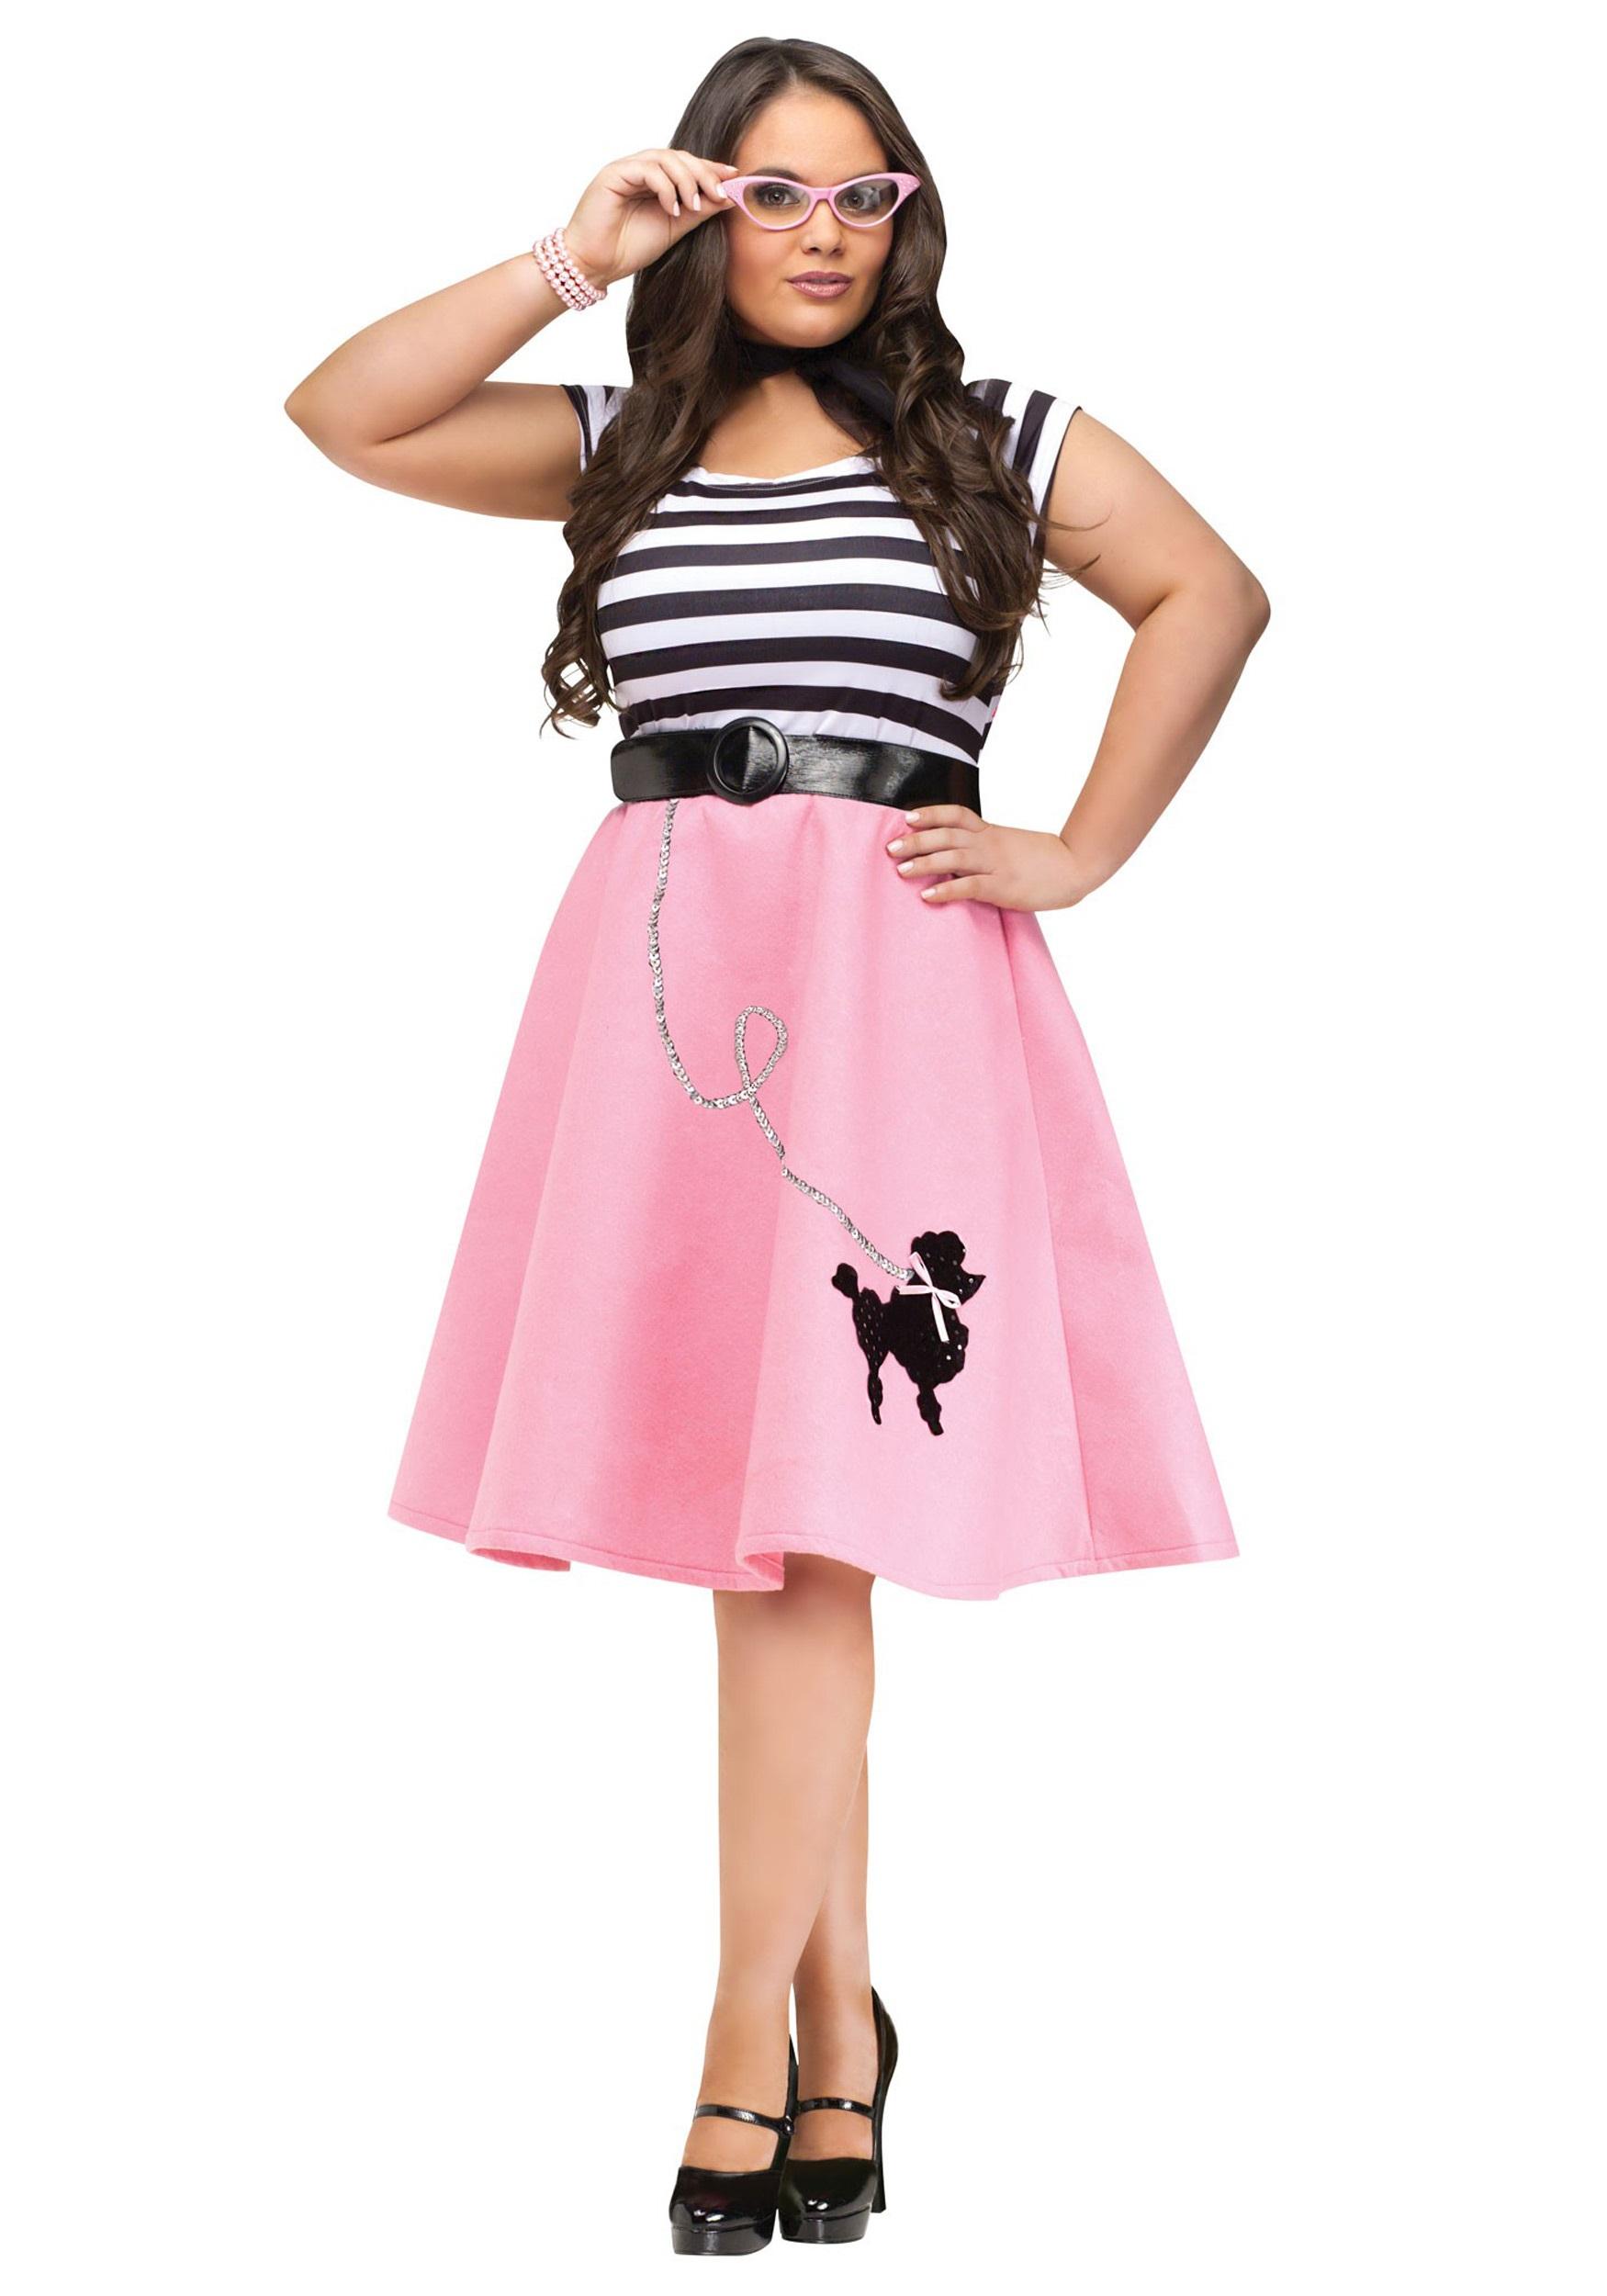 878d009b988b1 Poodle Skirt Dress Costume- Plus Size